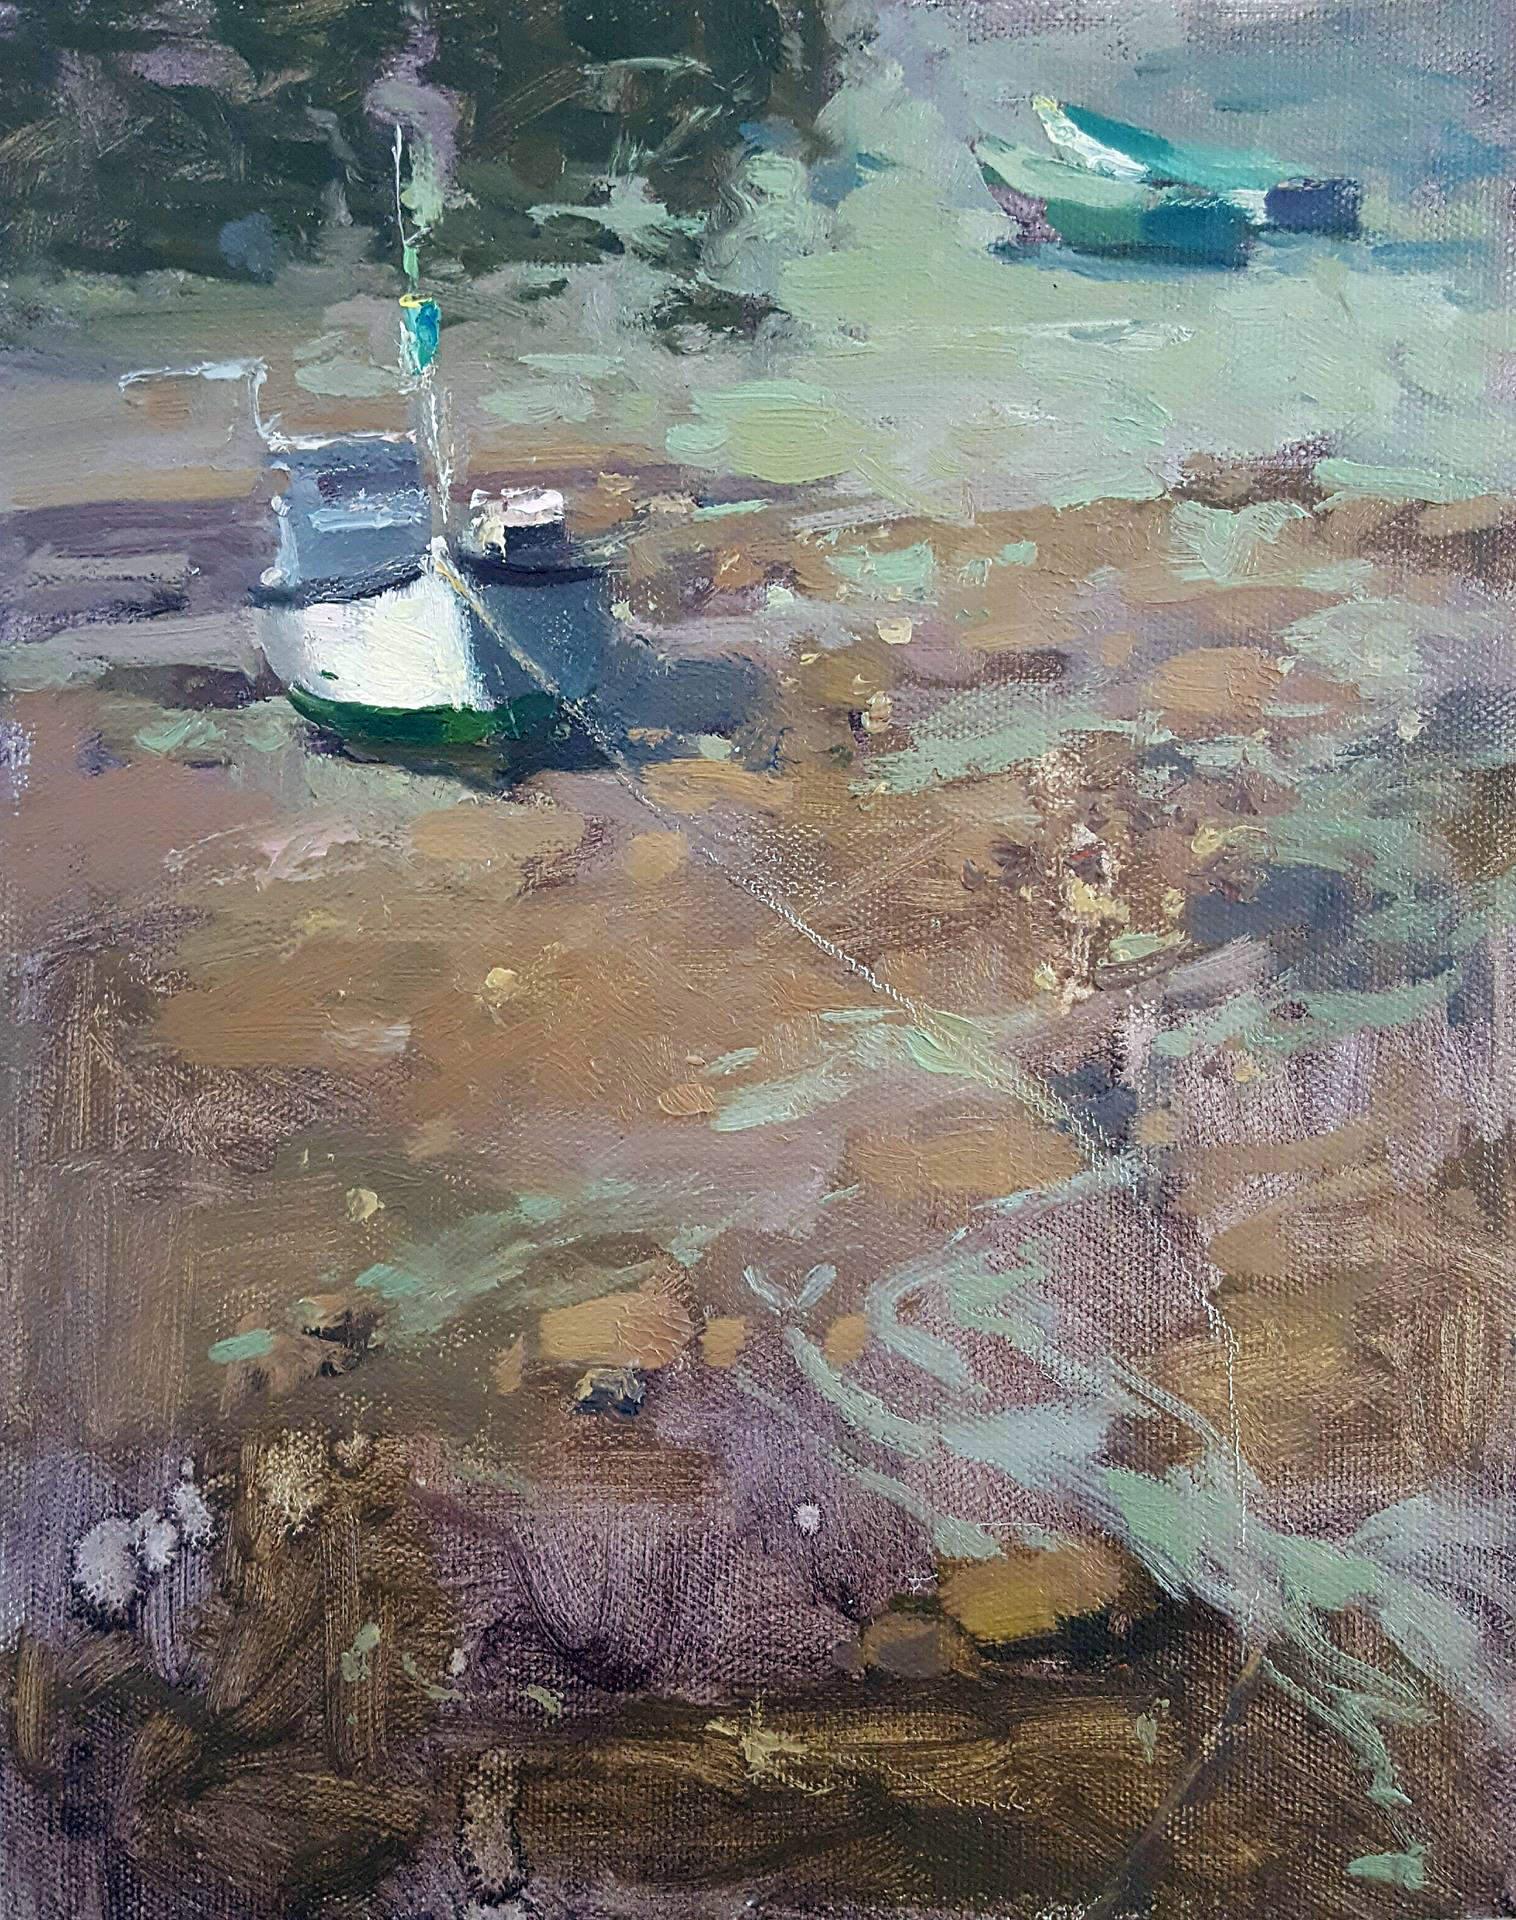 Debra Joyce Dawson | LOW TIDE, ACADIA | oil | frame size 15x13